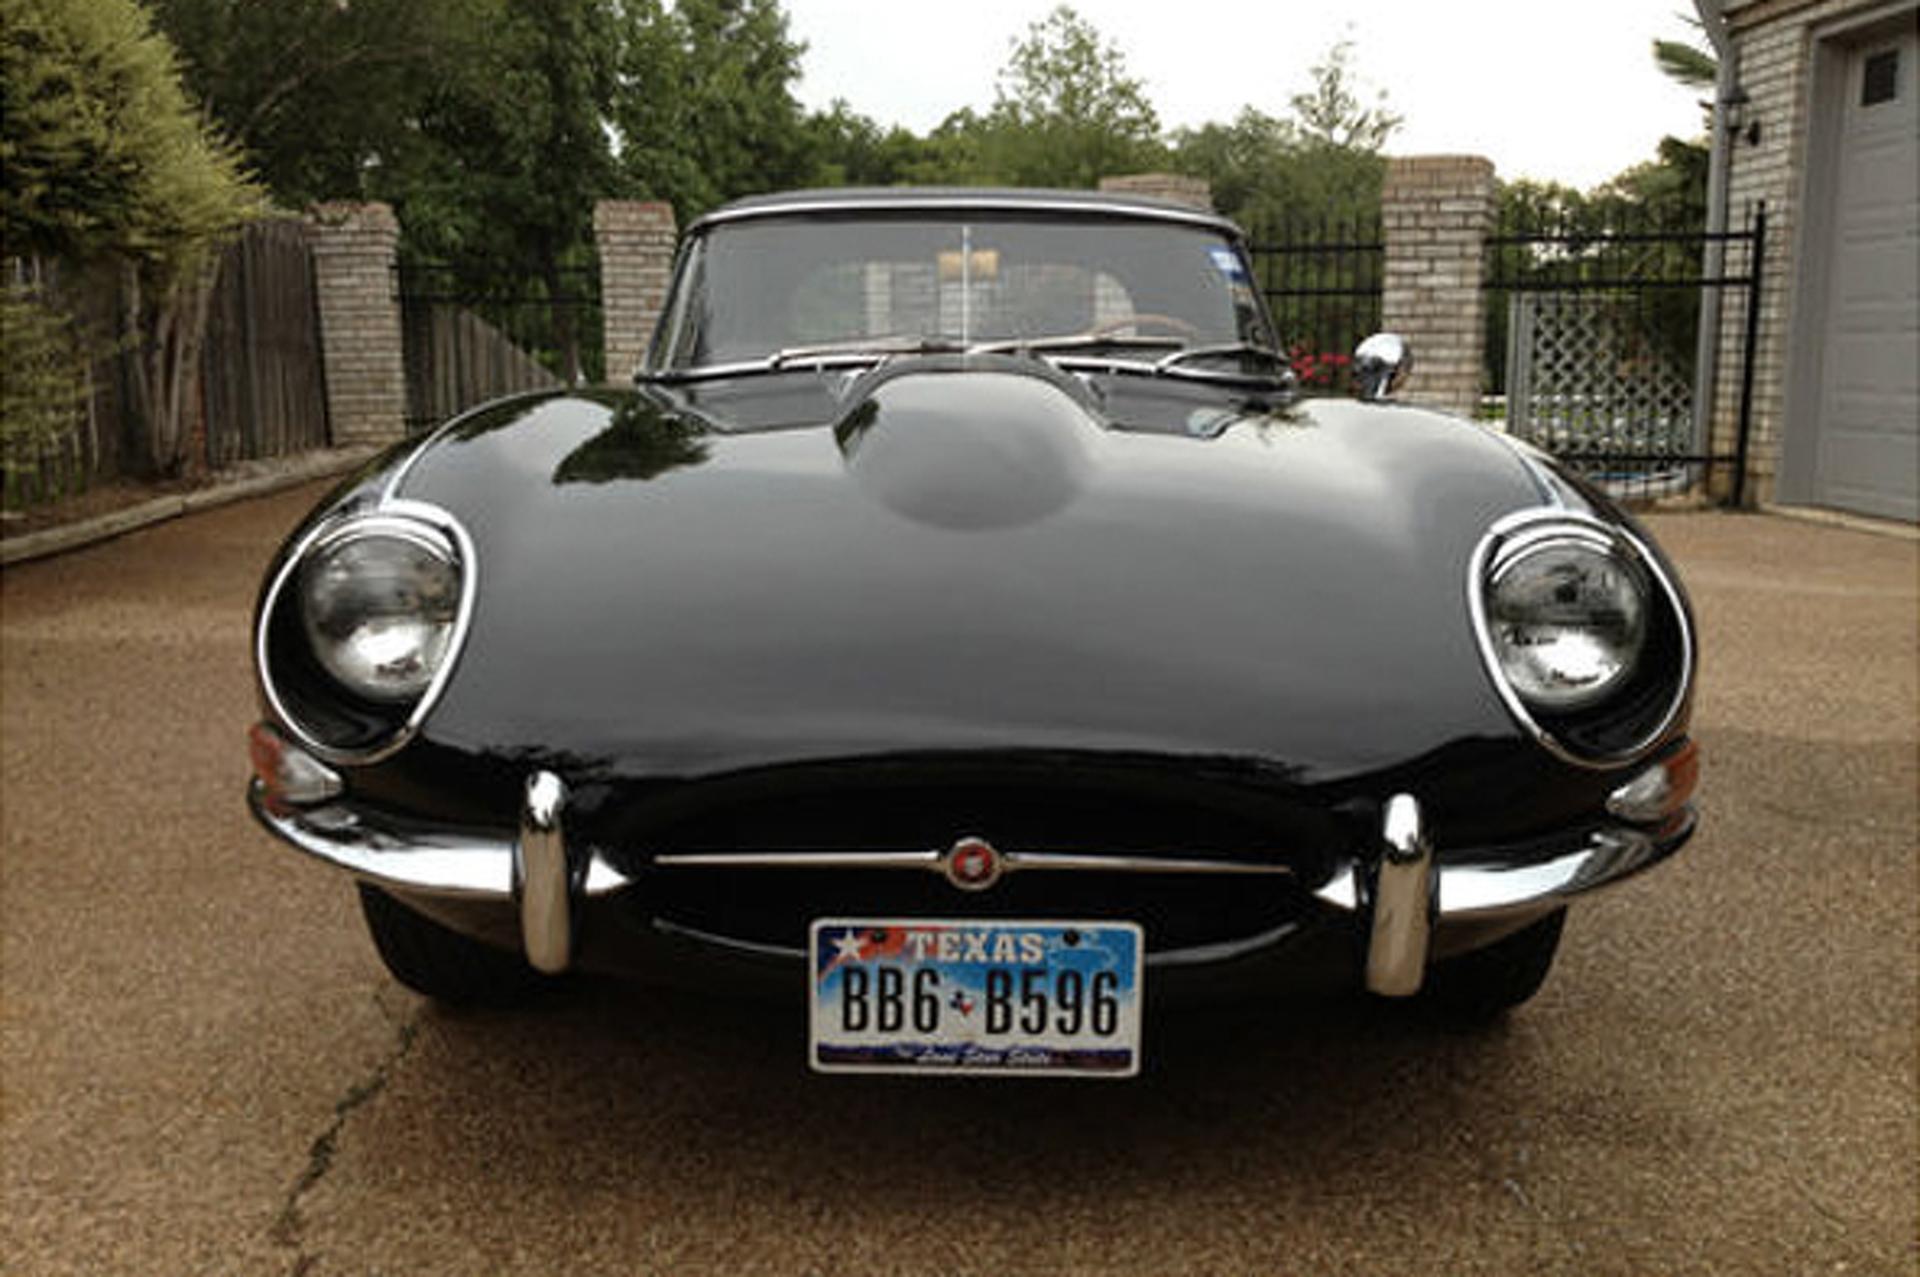 Classic Jaguar Cars For Sale On Ebay